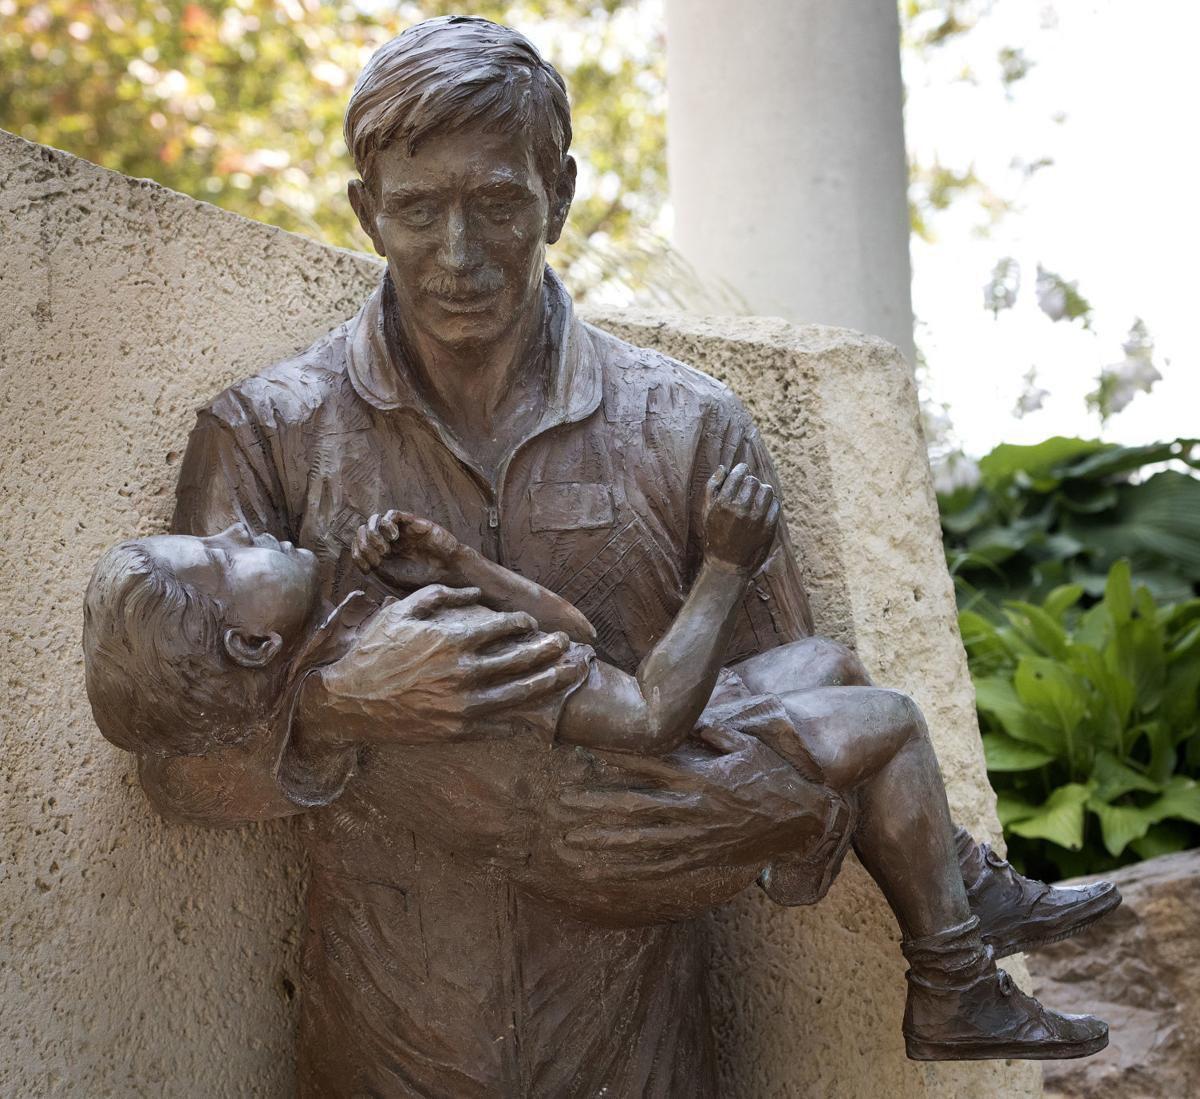 The Spirit of Siouxland Statue